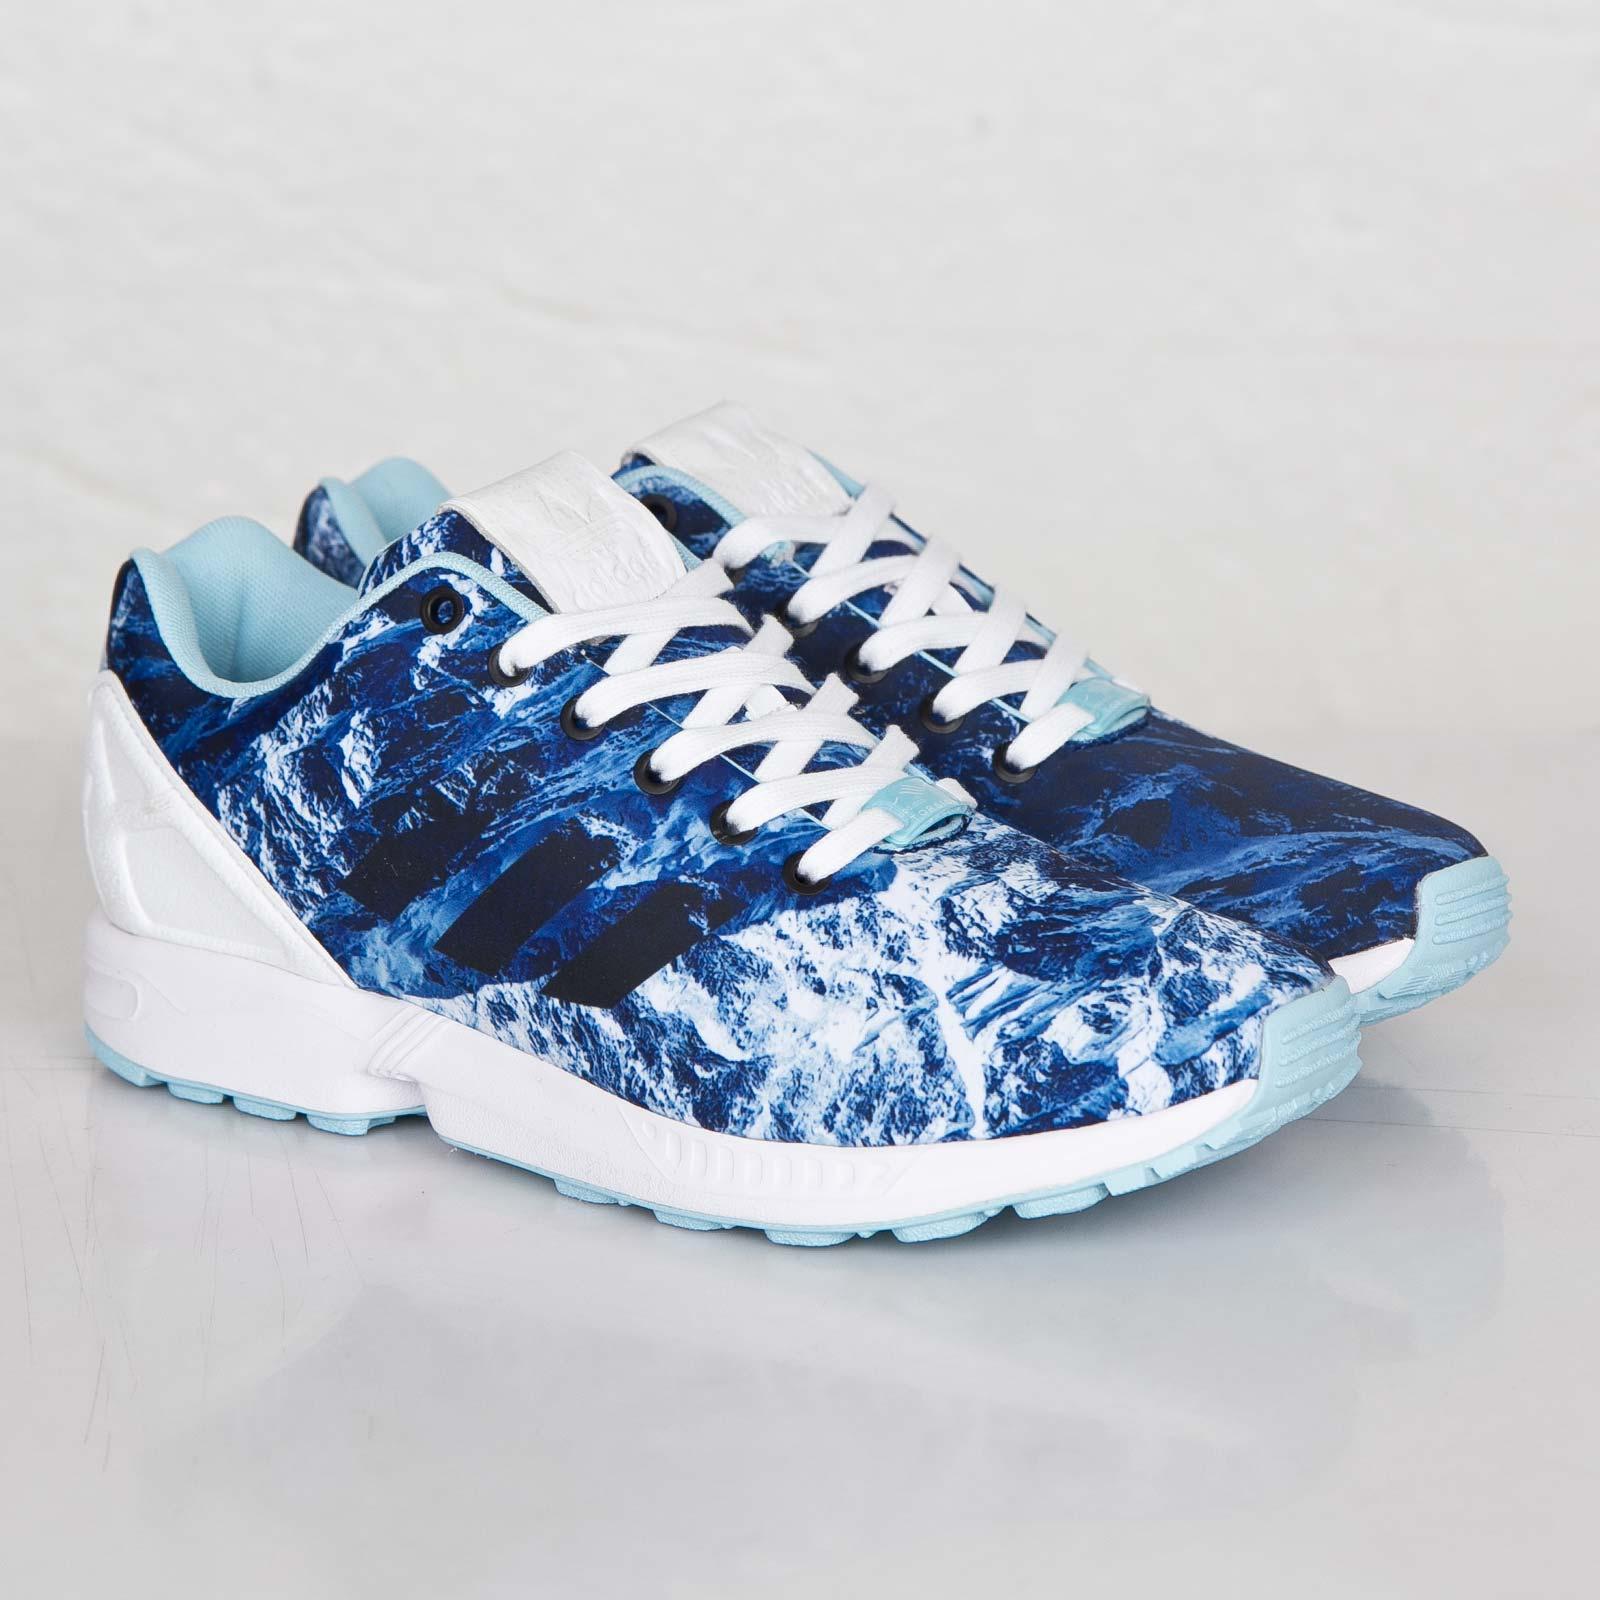 zx flux adidas wave